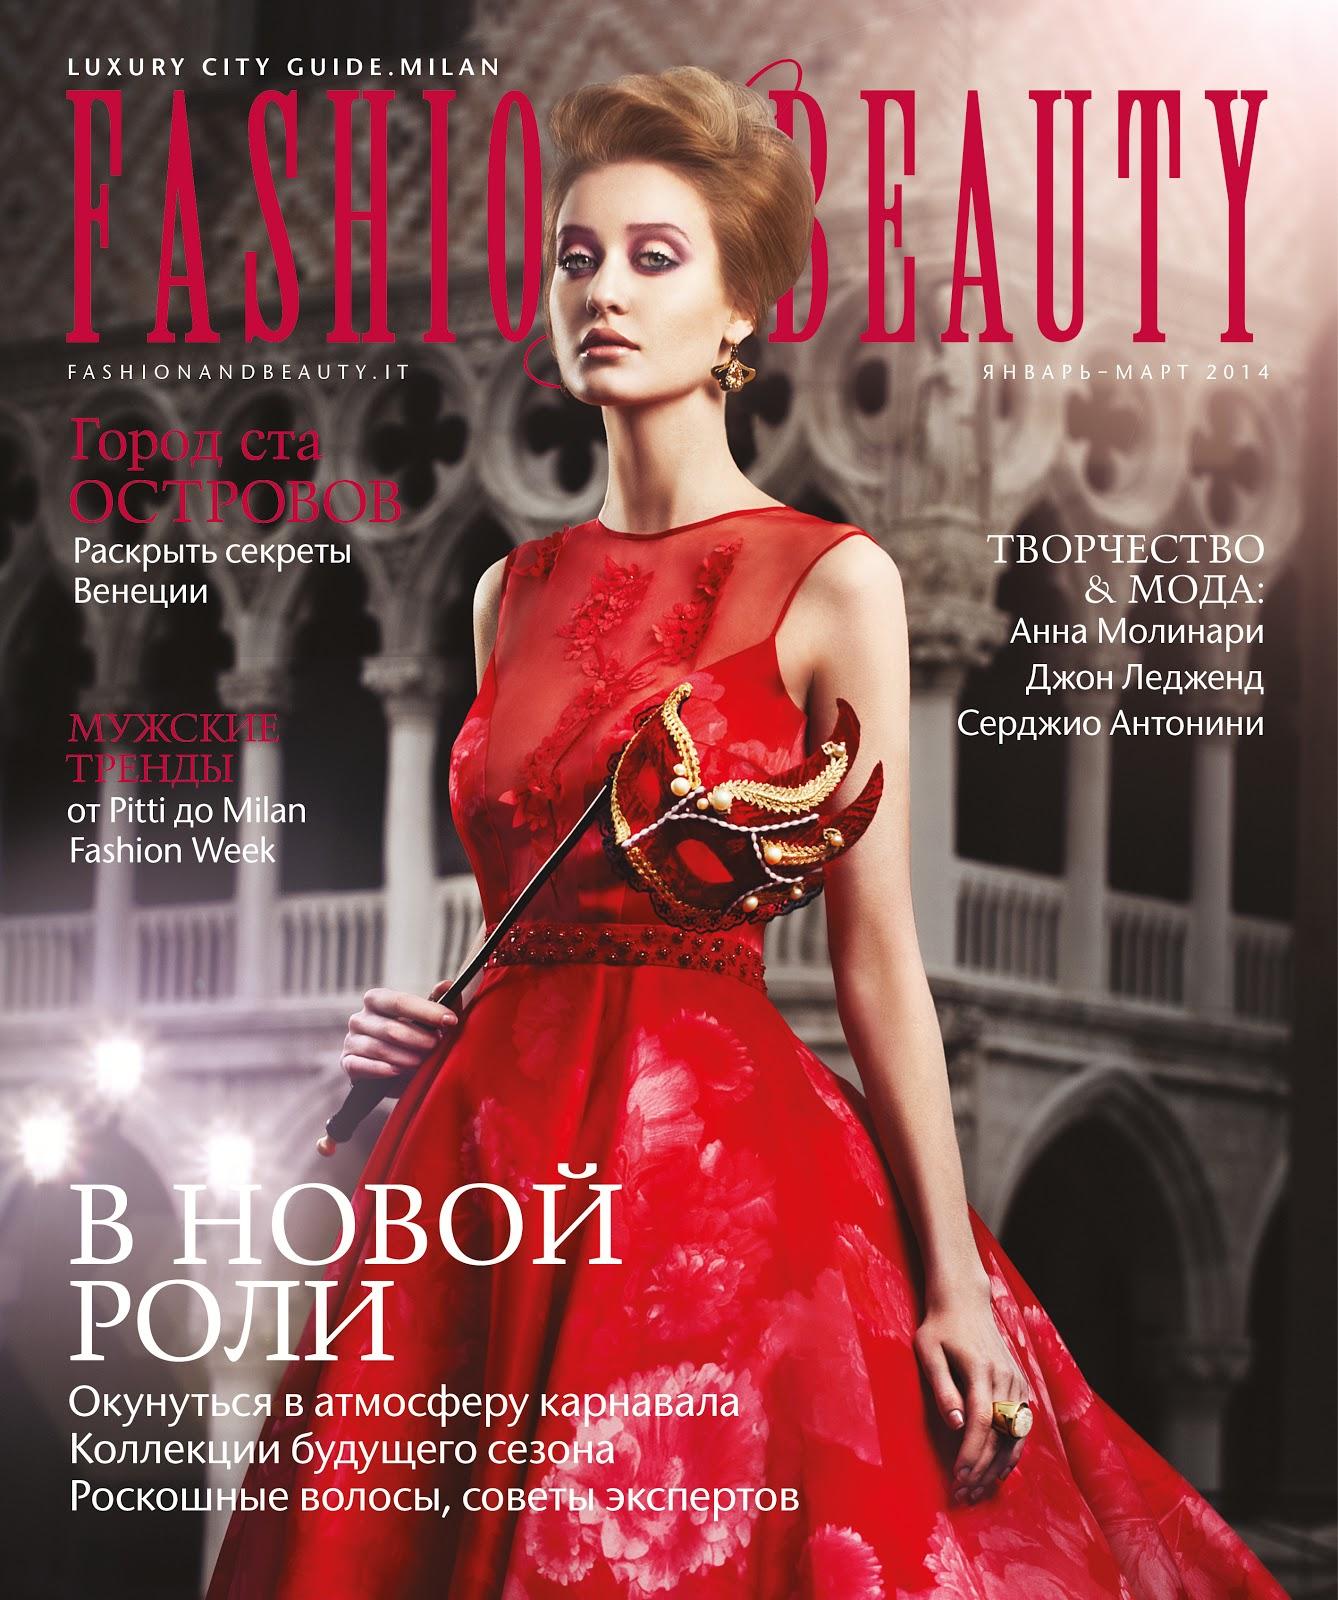 Beauty 2 Fashion: Duchess For A Night: Enya Bakunova By Lior Susana For